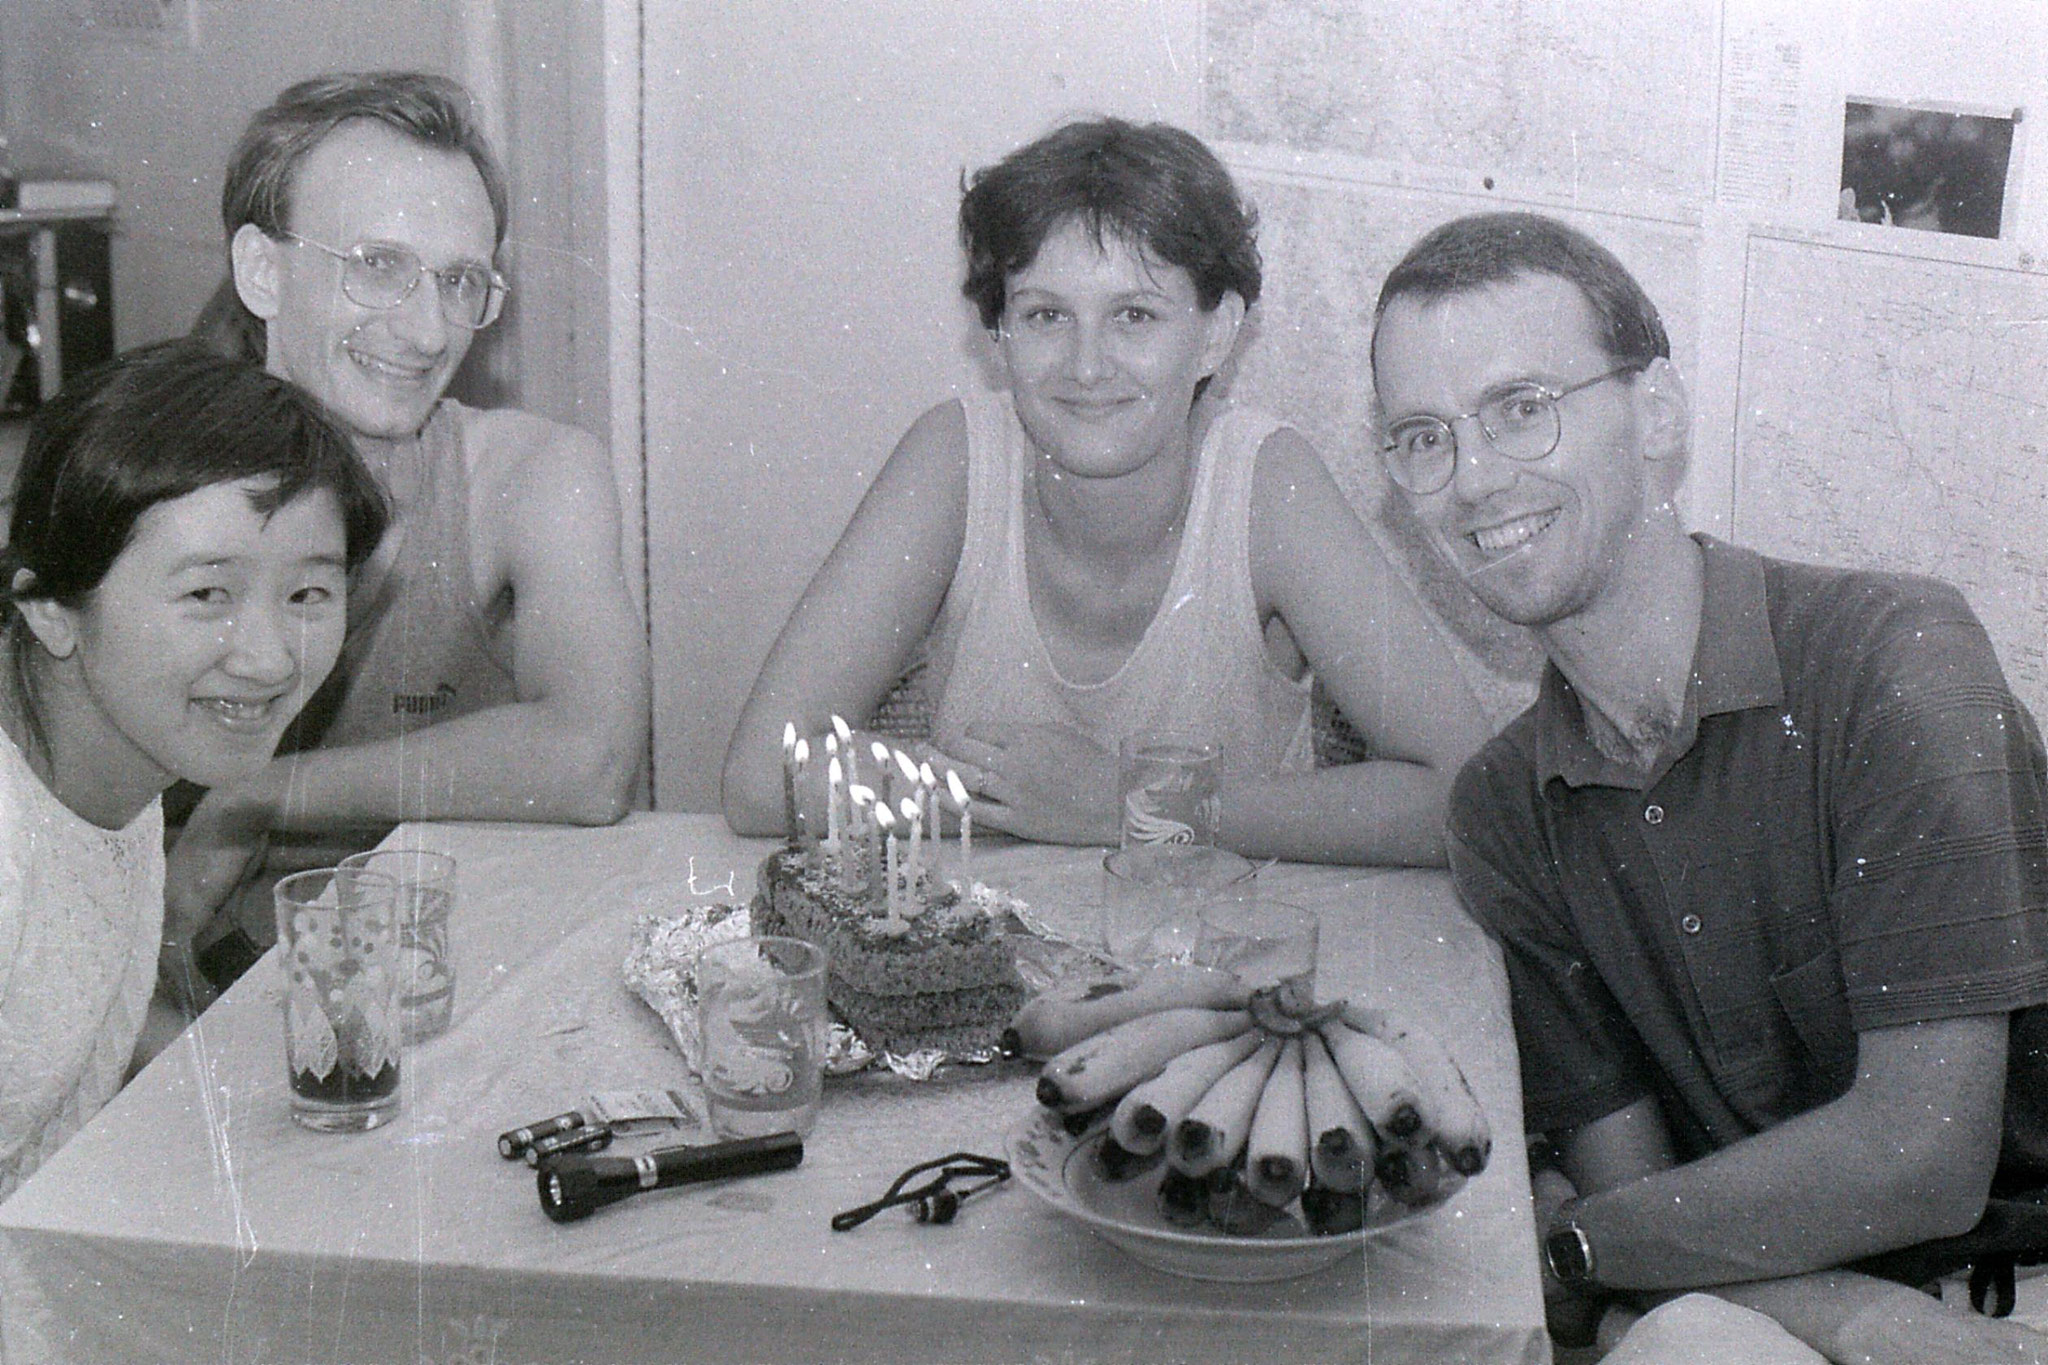 20/7/1989: 19: PDD, Boquets and R